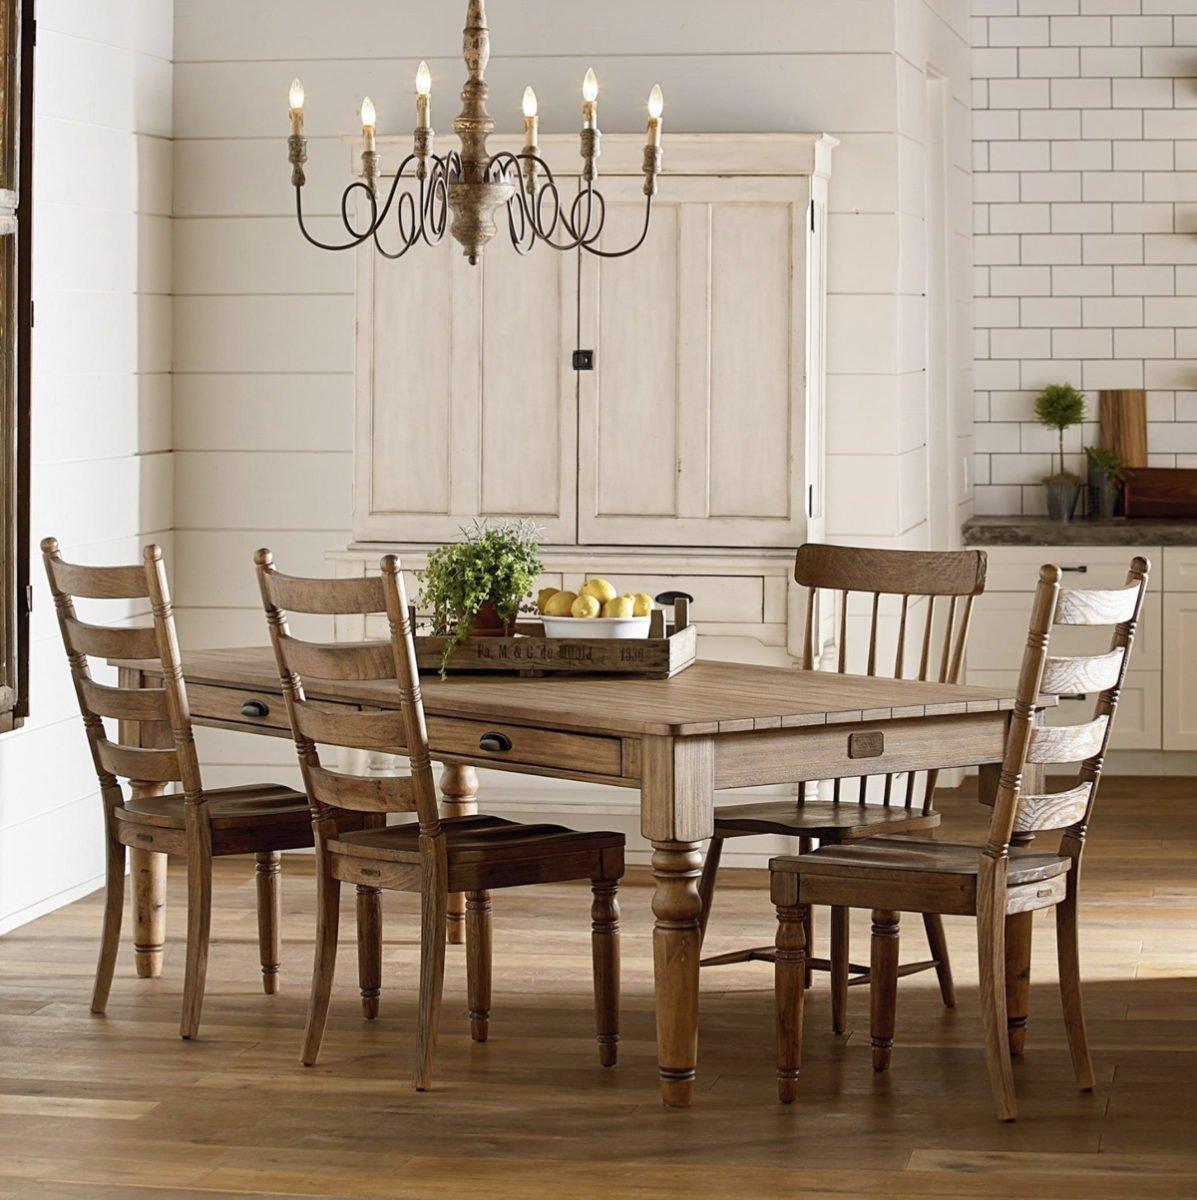 color-magnolia-arredare-casa-stile-ed-eleganza-cucina-6